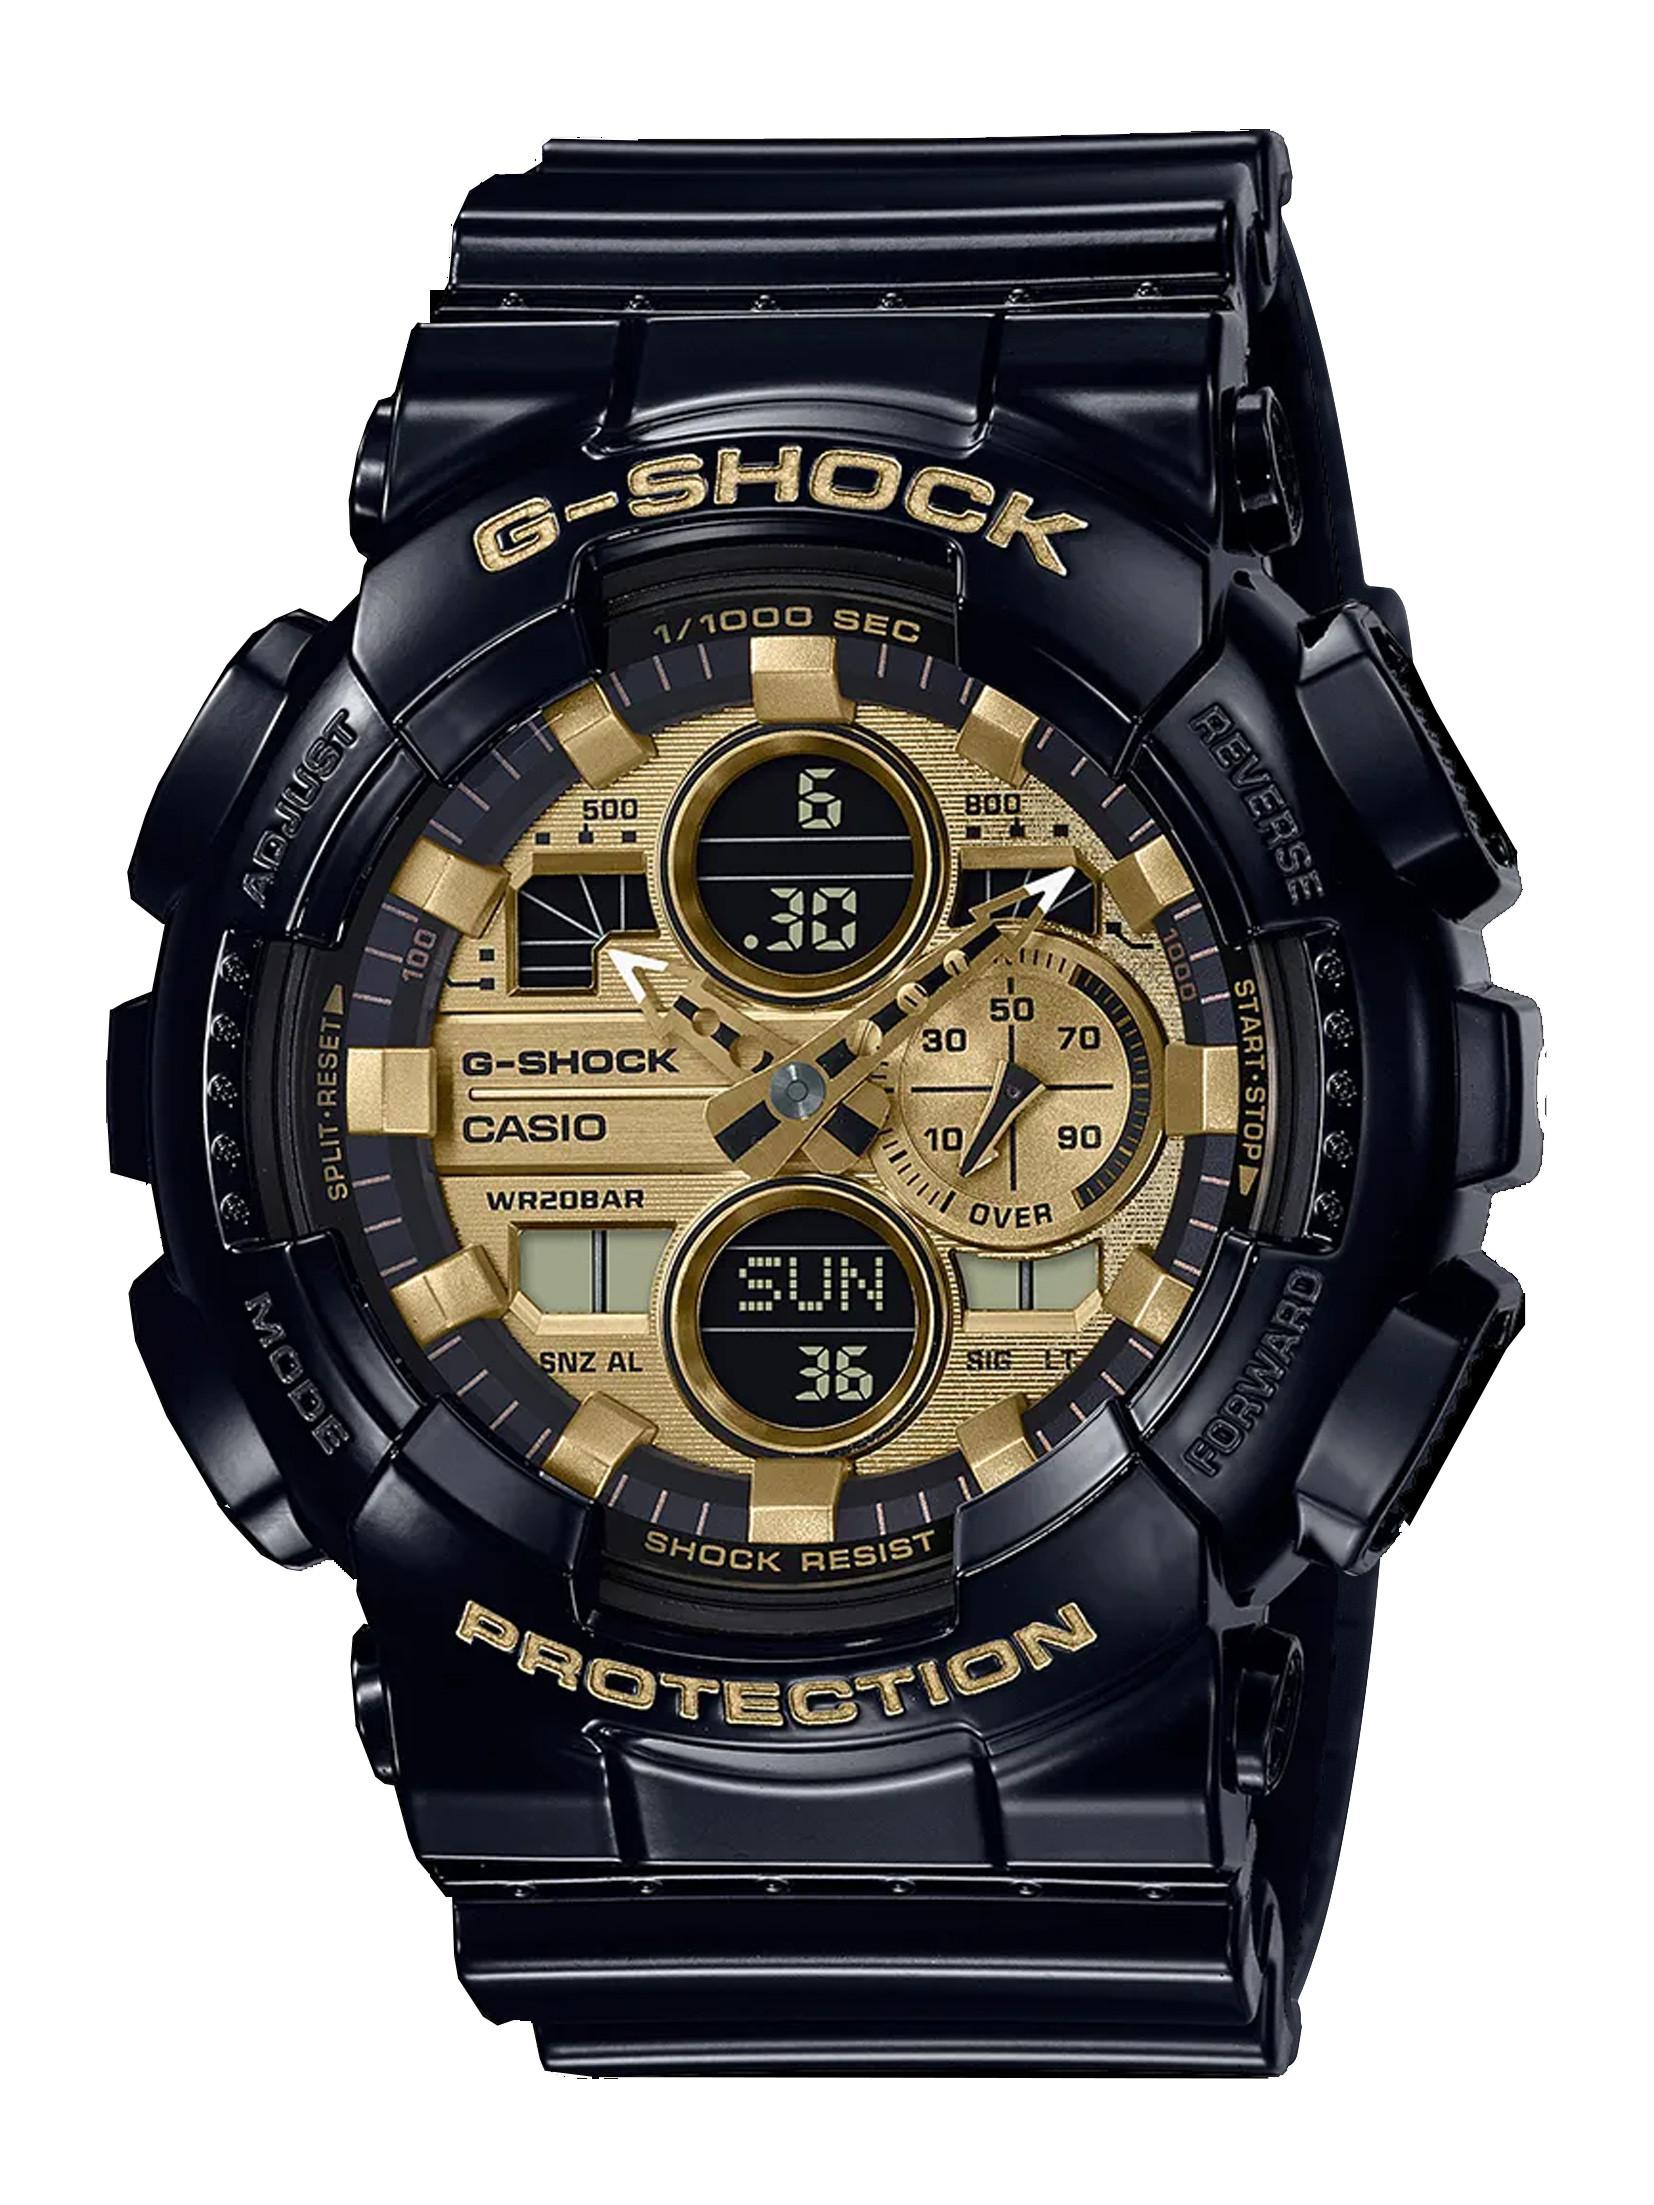 G-SHOCK G-140 Series Analog Digital Watch – 51.2mm